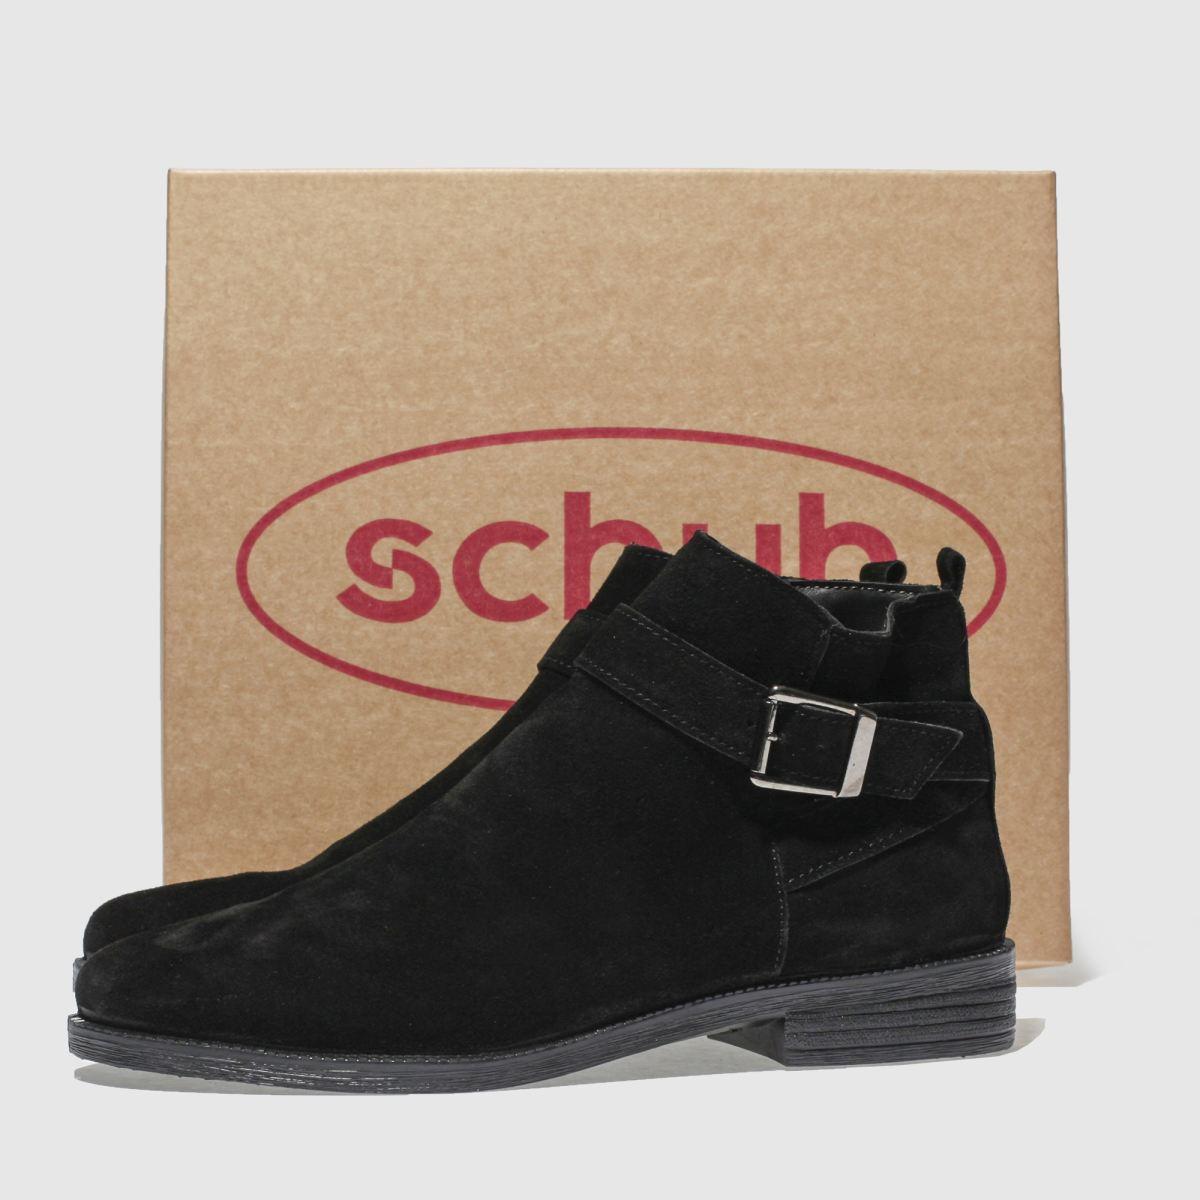 Damen Schwarz schuh Respect Qualität Boots | schuh Gute Qualität Respect beliebte Schuhe f6e45e